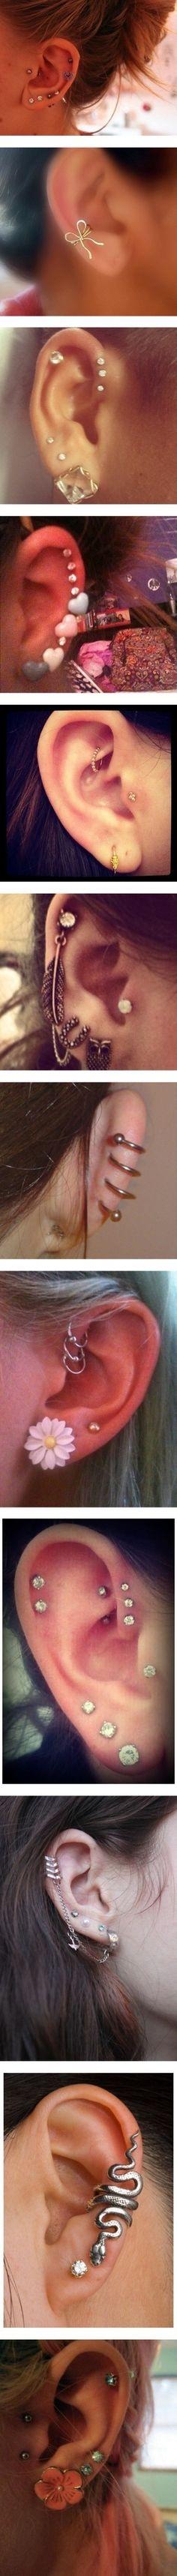 Diferentes orejas